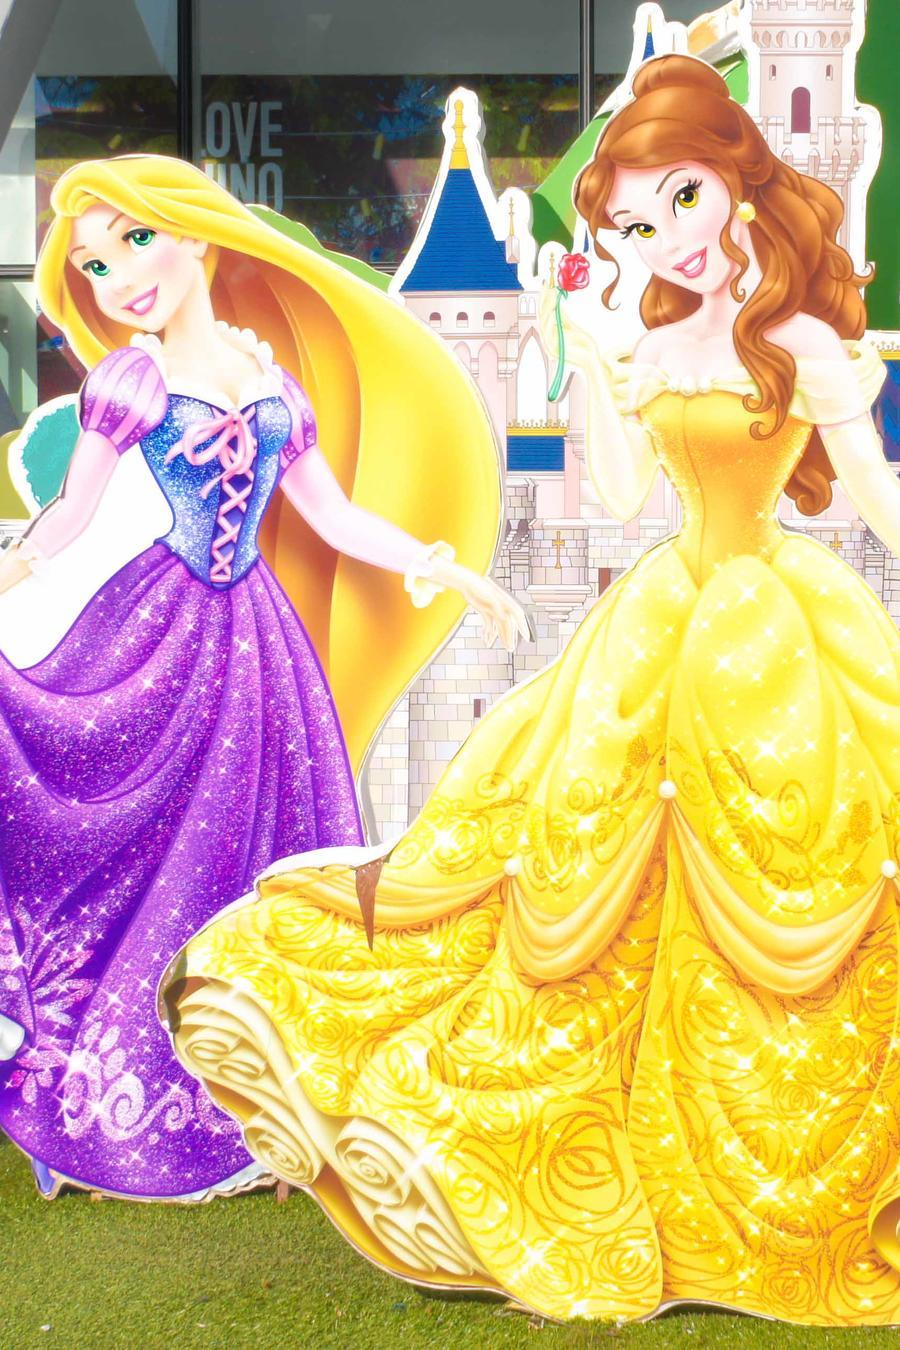 Dibujos de princesas de Disney